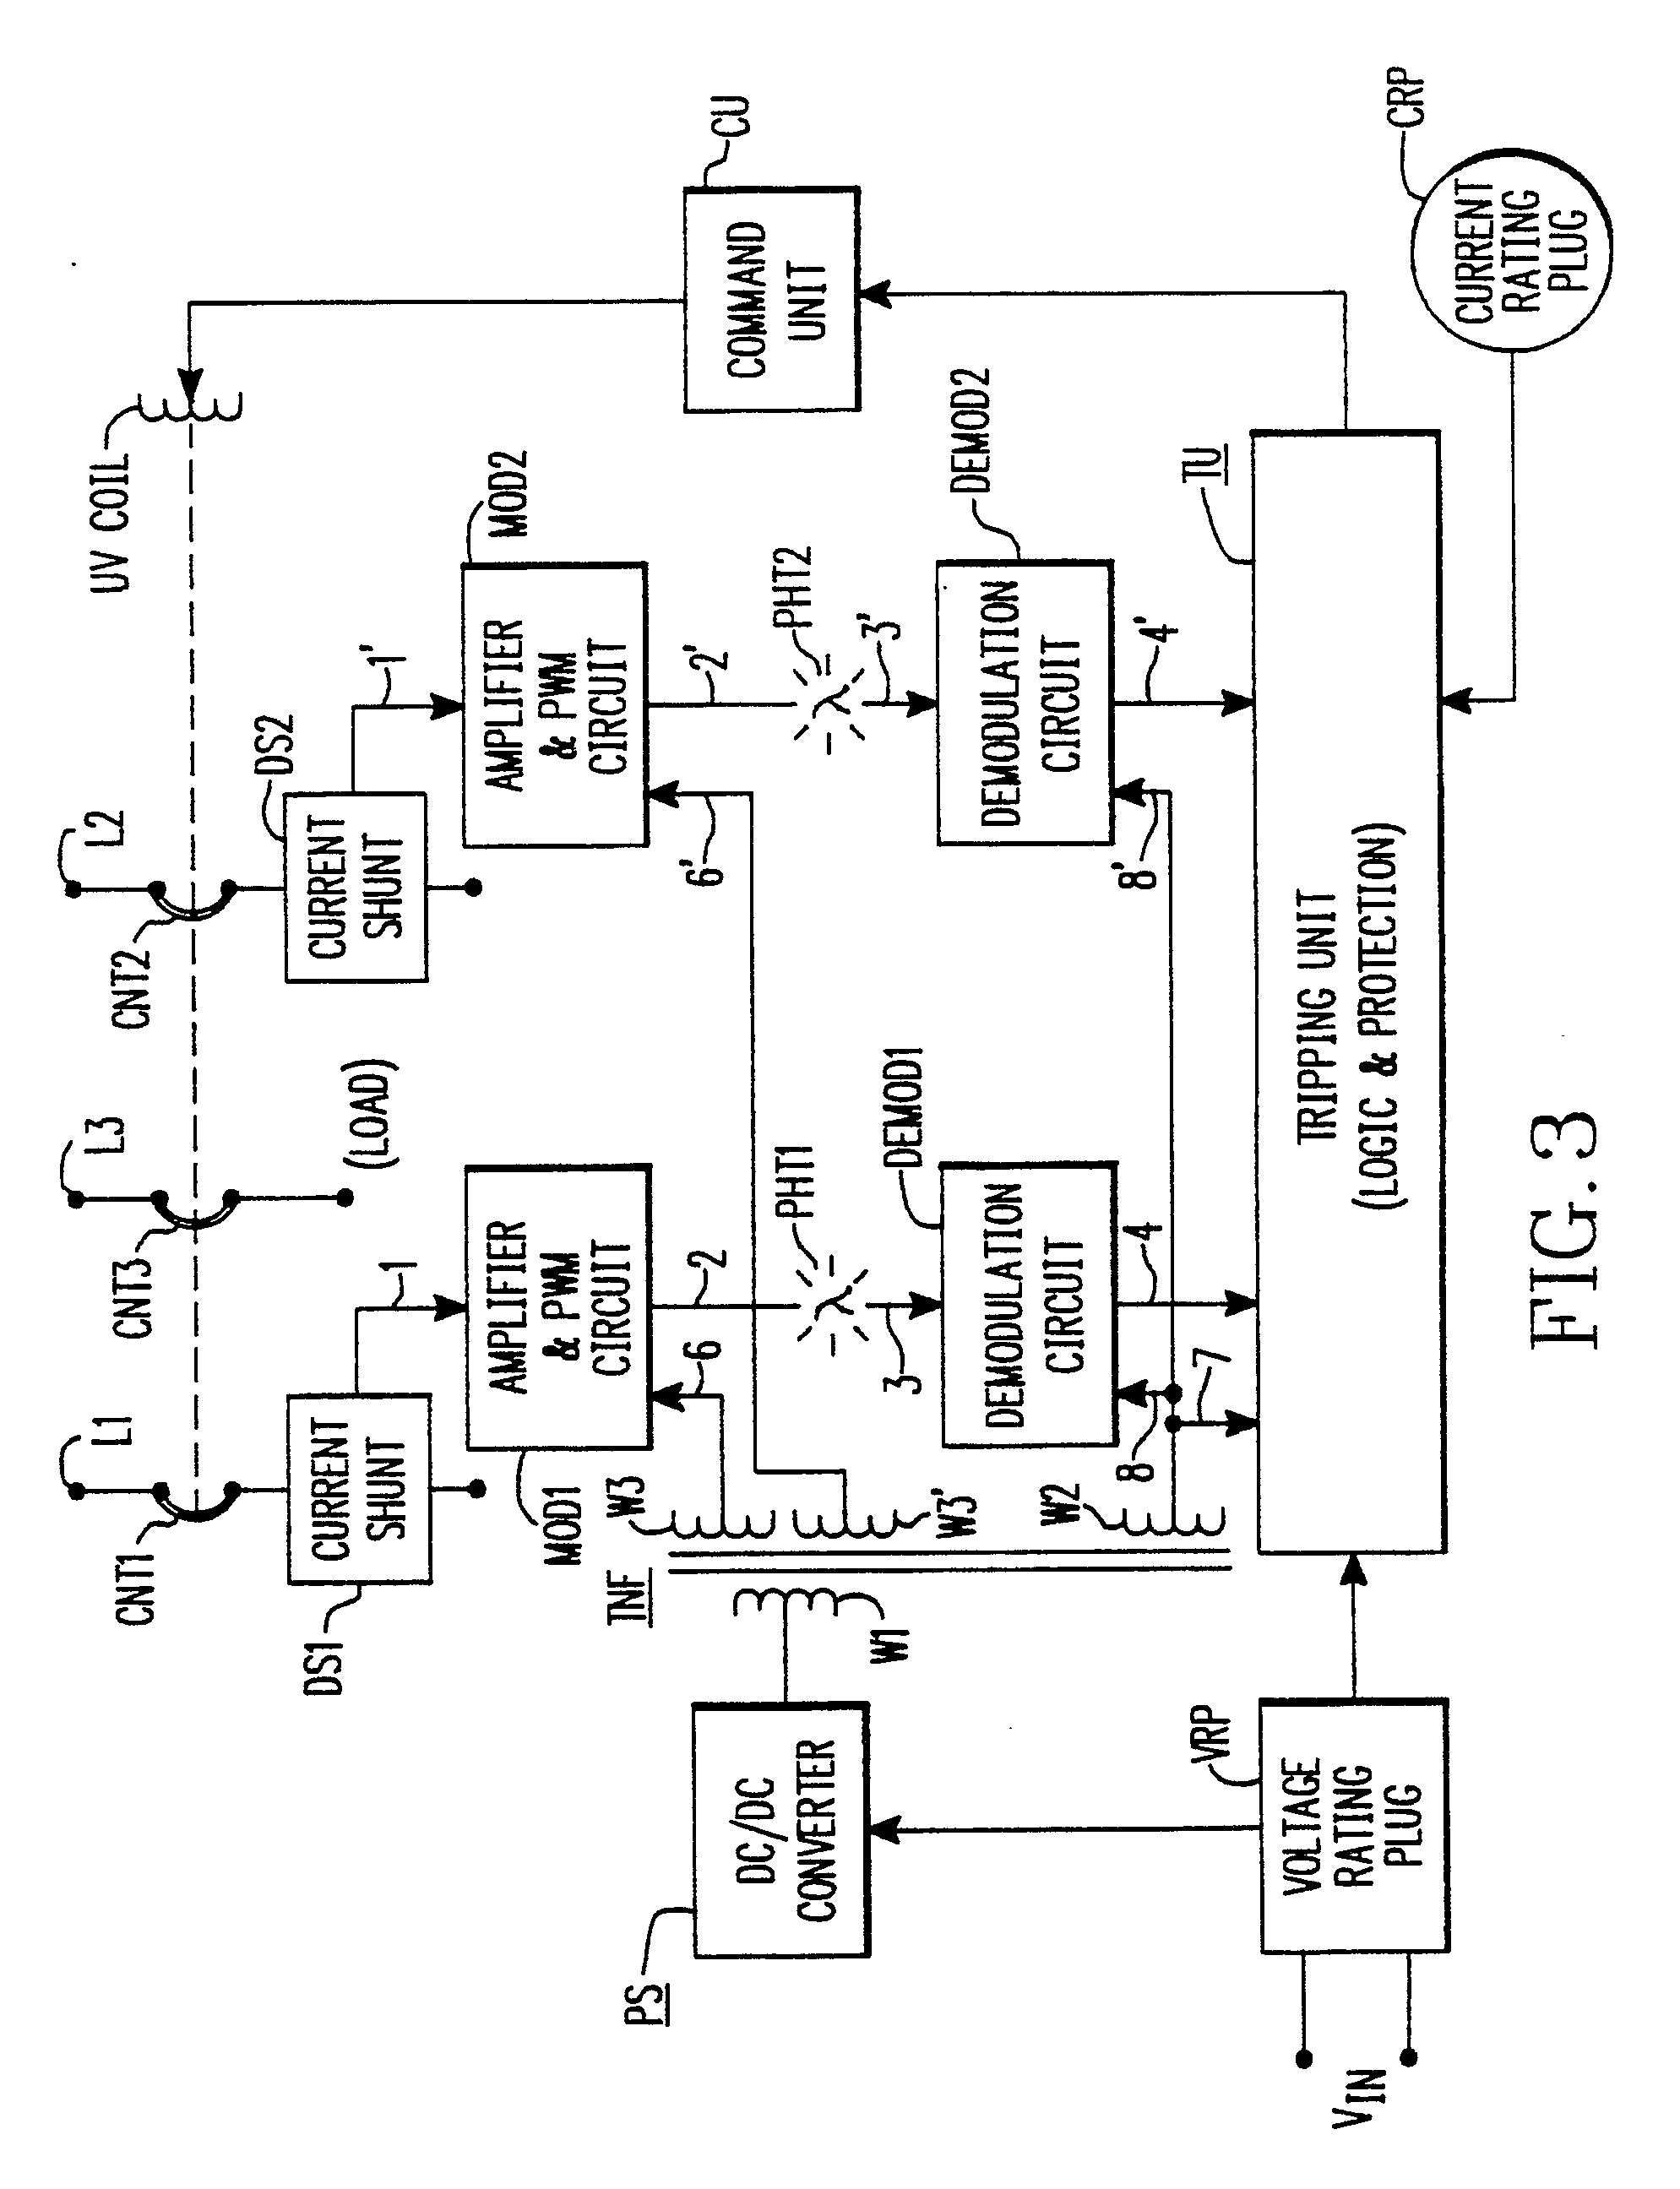 patent ep0407105a2